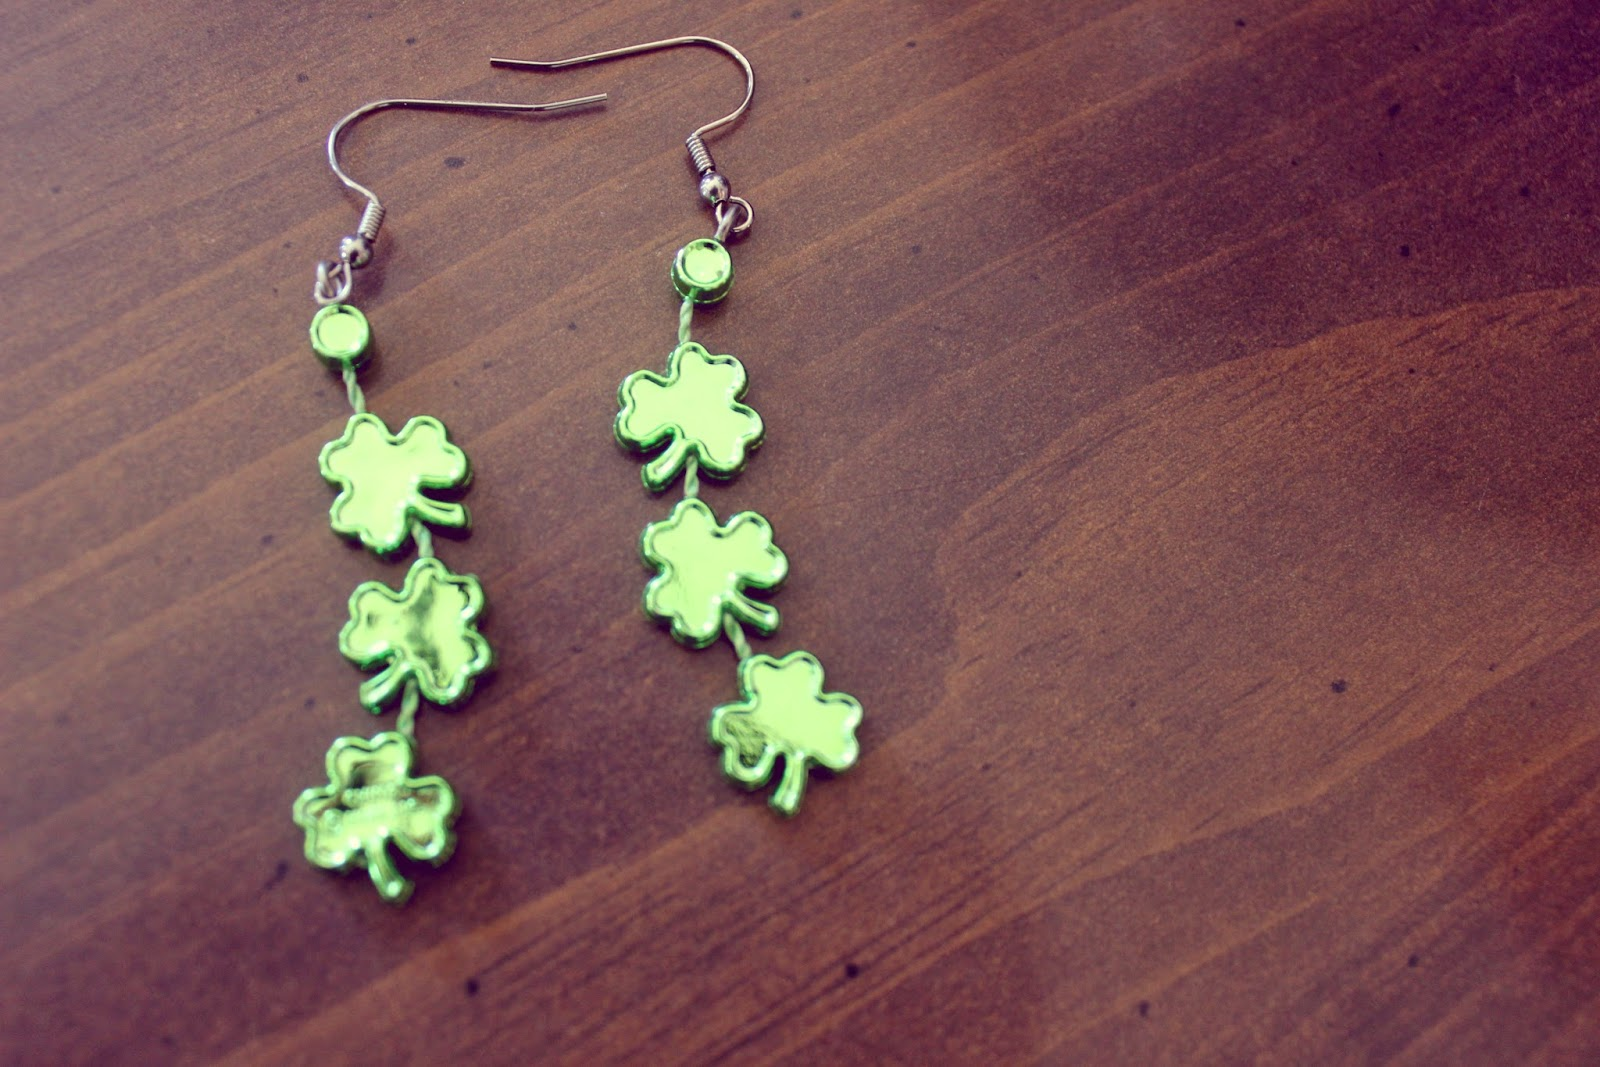 Saint Patrick's Day Earrings